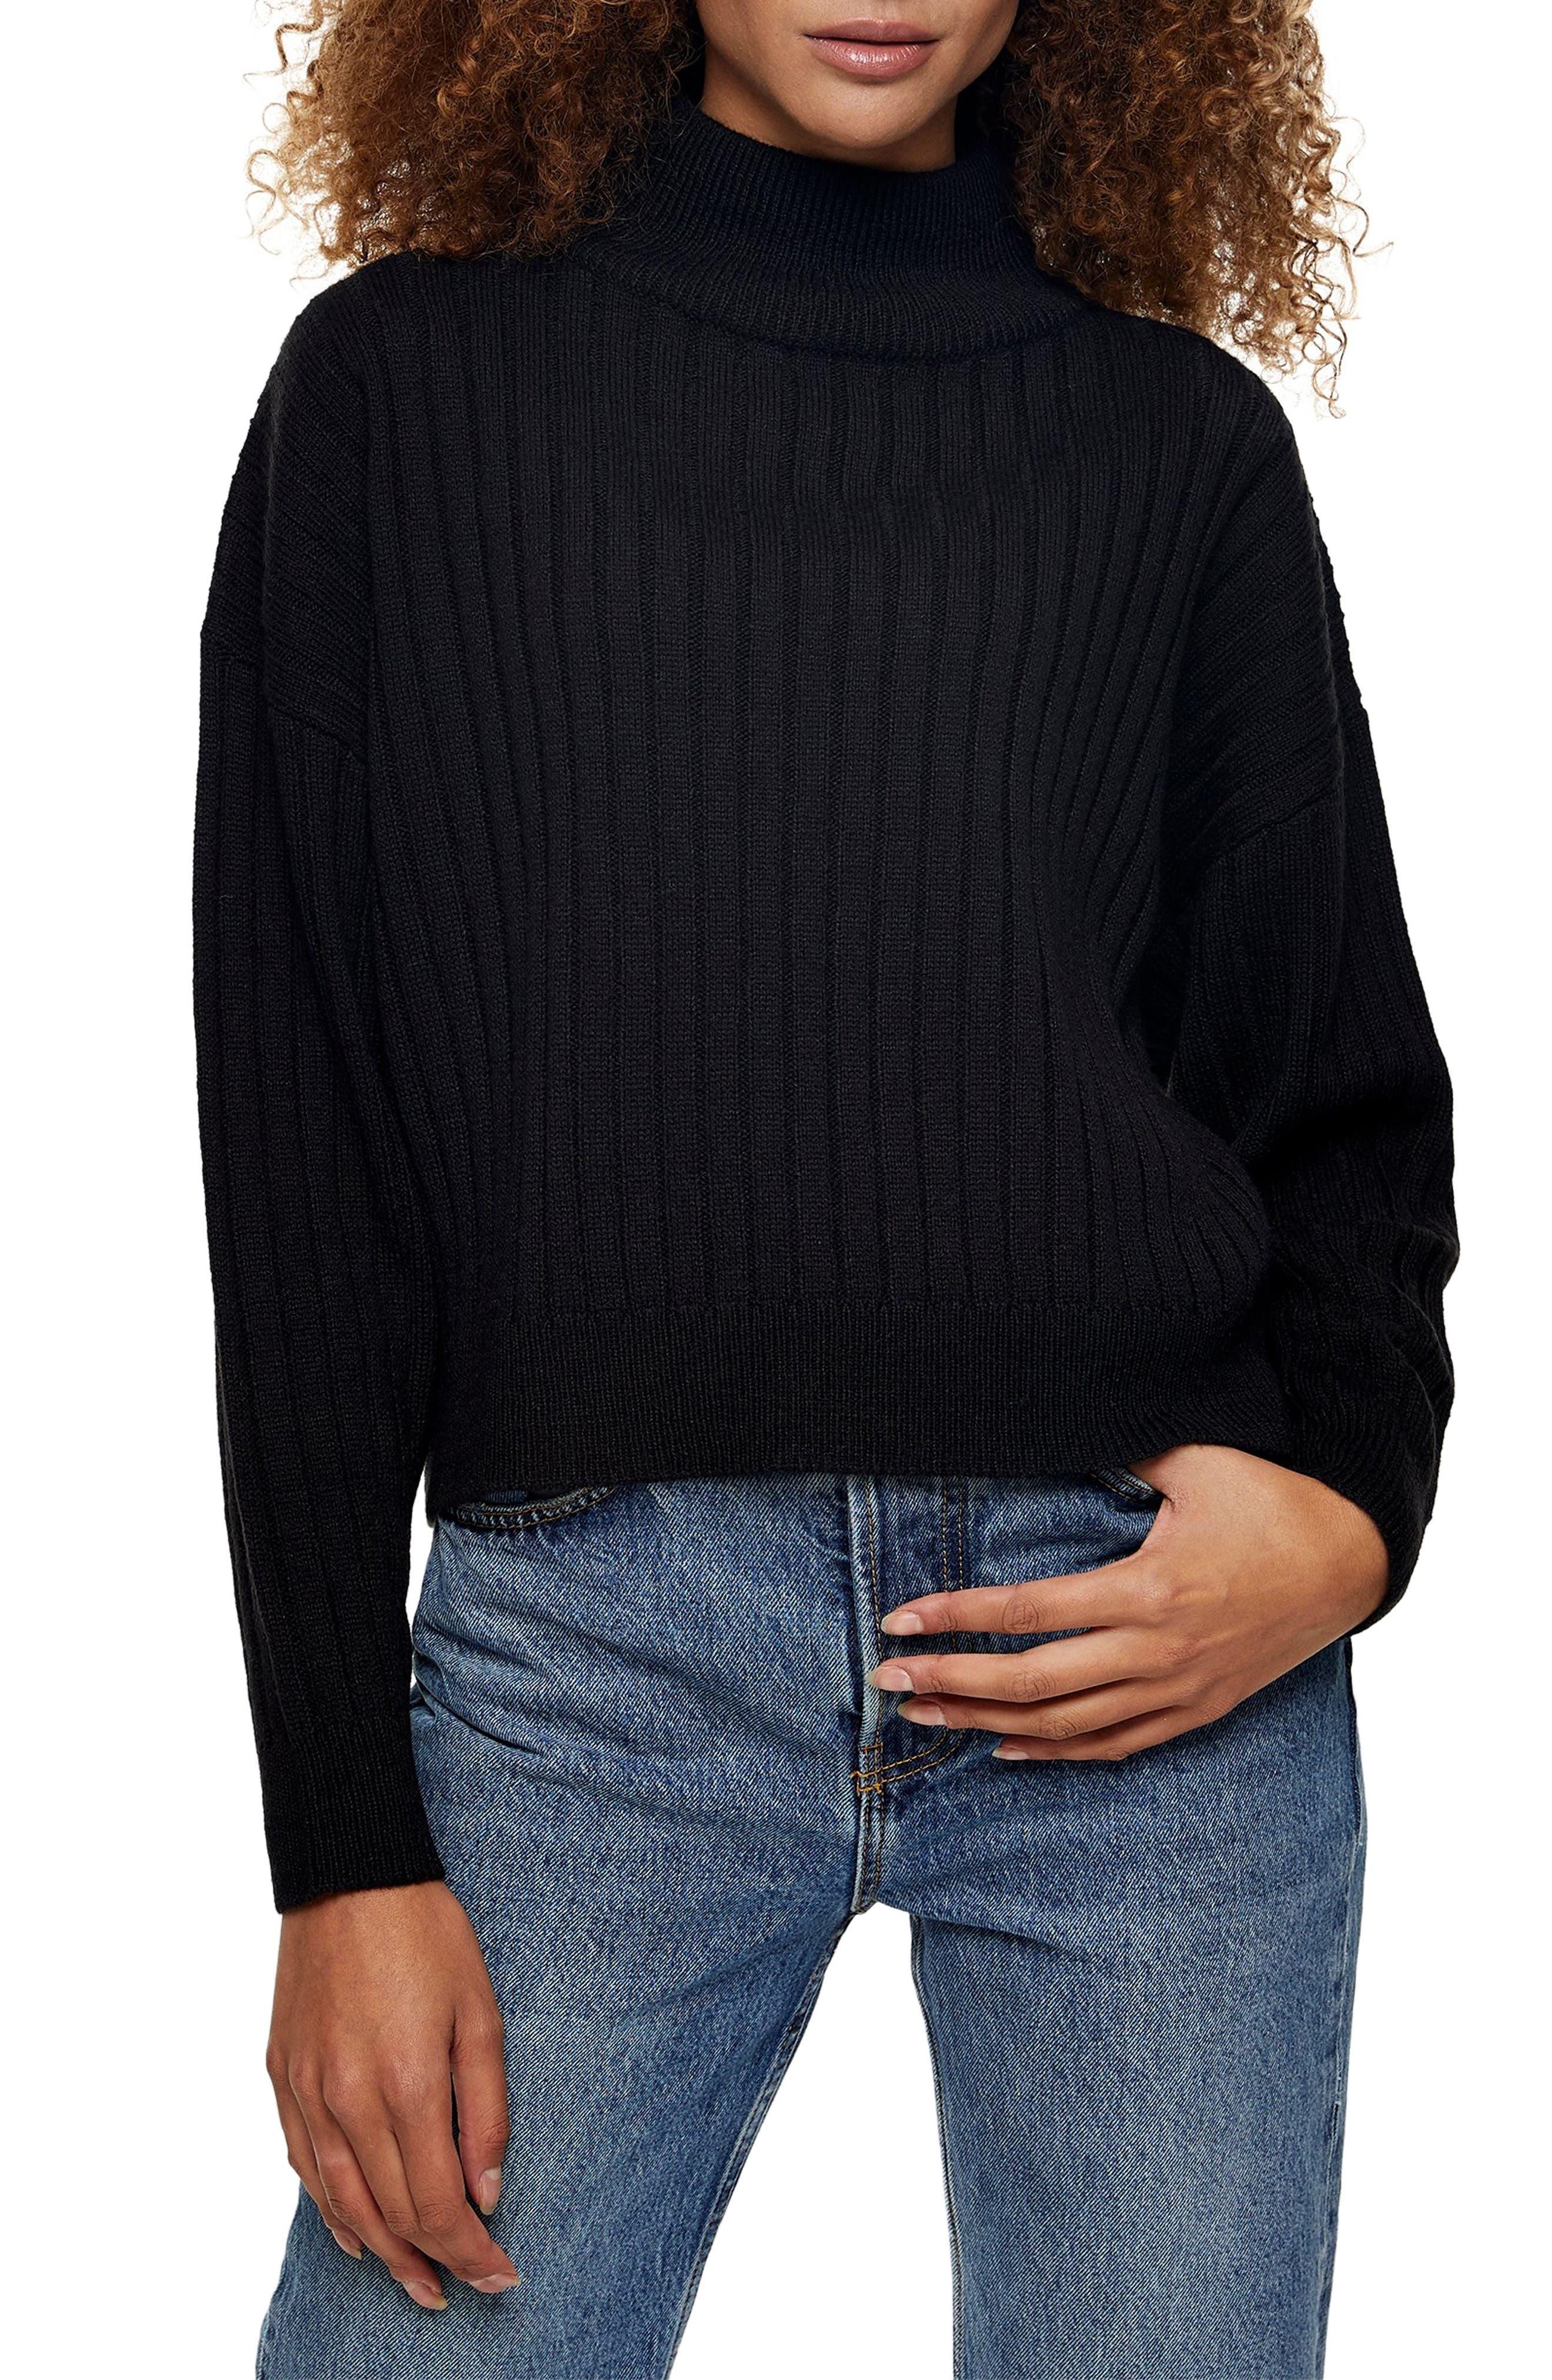 Image of TOPSHOP Rib Knit Turtleneck Sweater